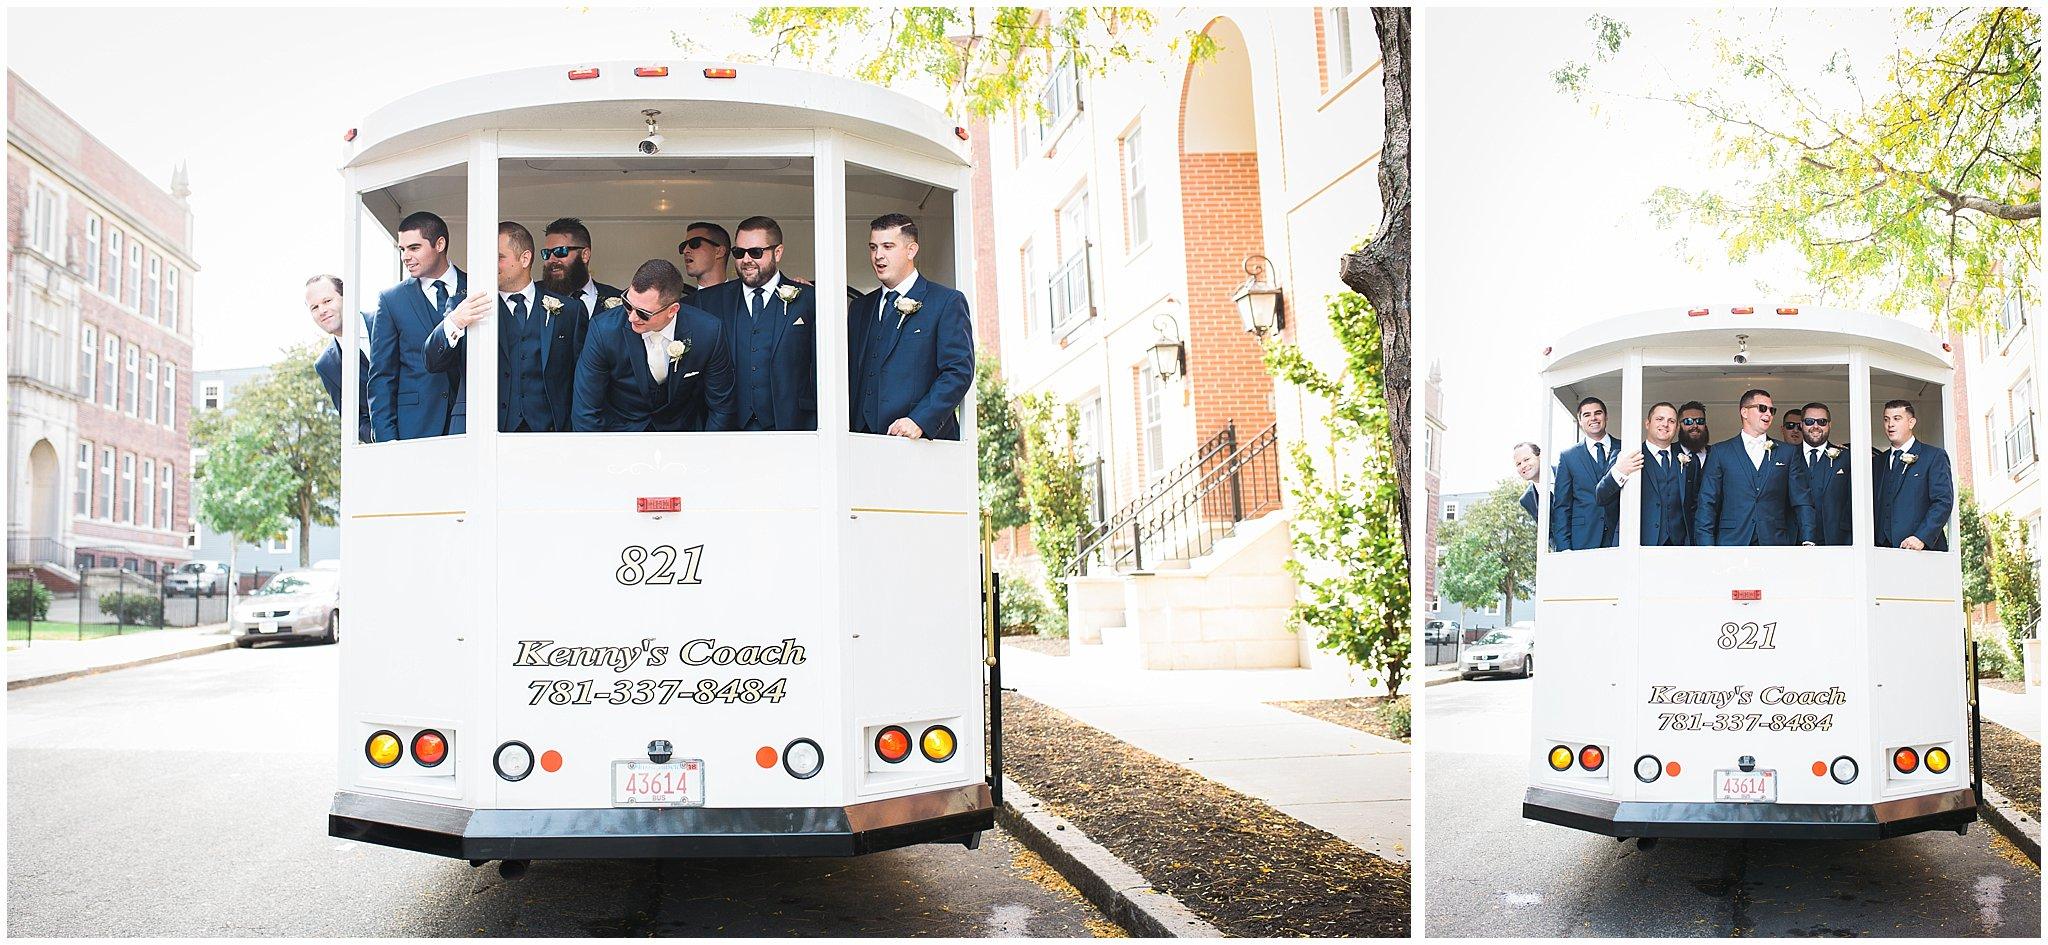 Seaport Hotel Wedding Boston Photographer Sweet Alice10.jpg